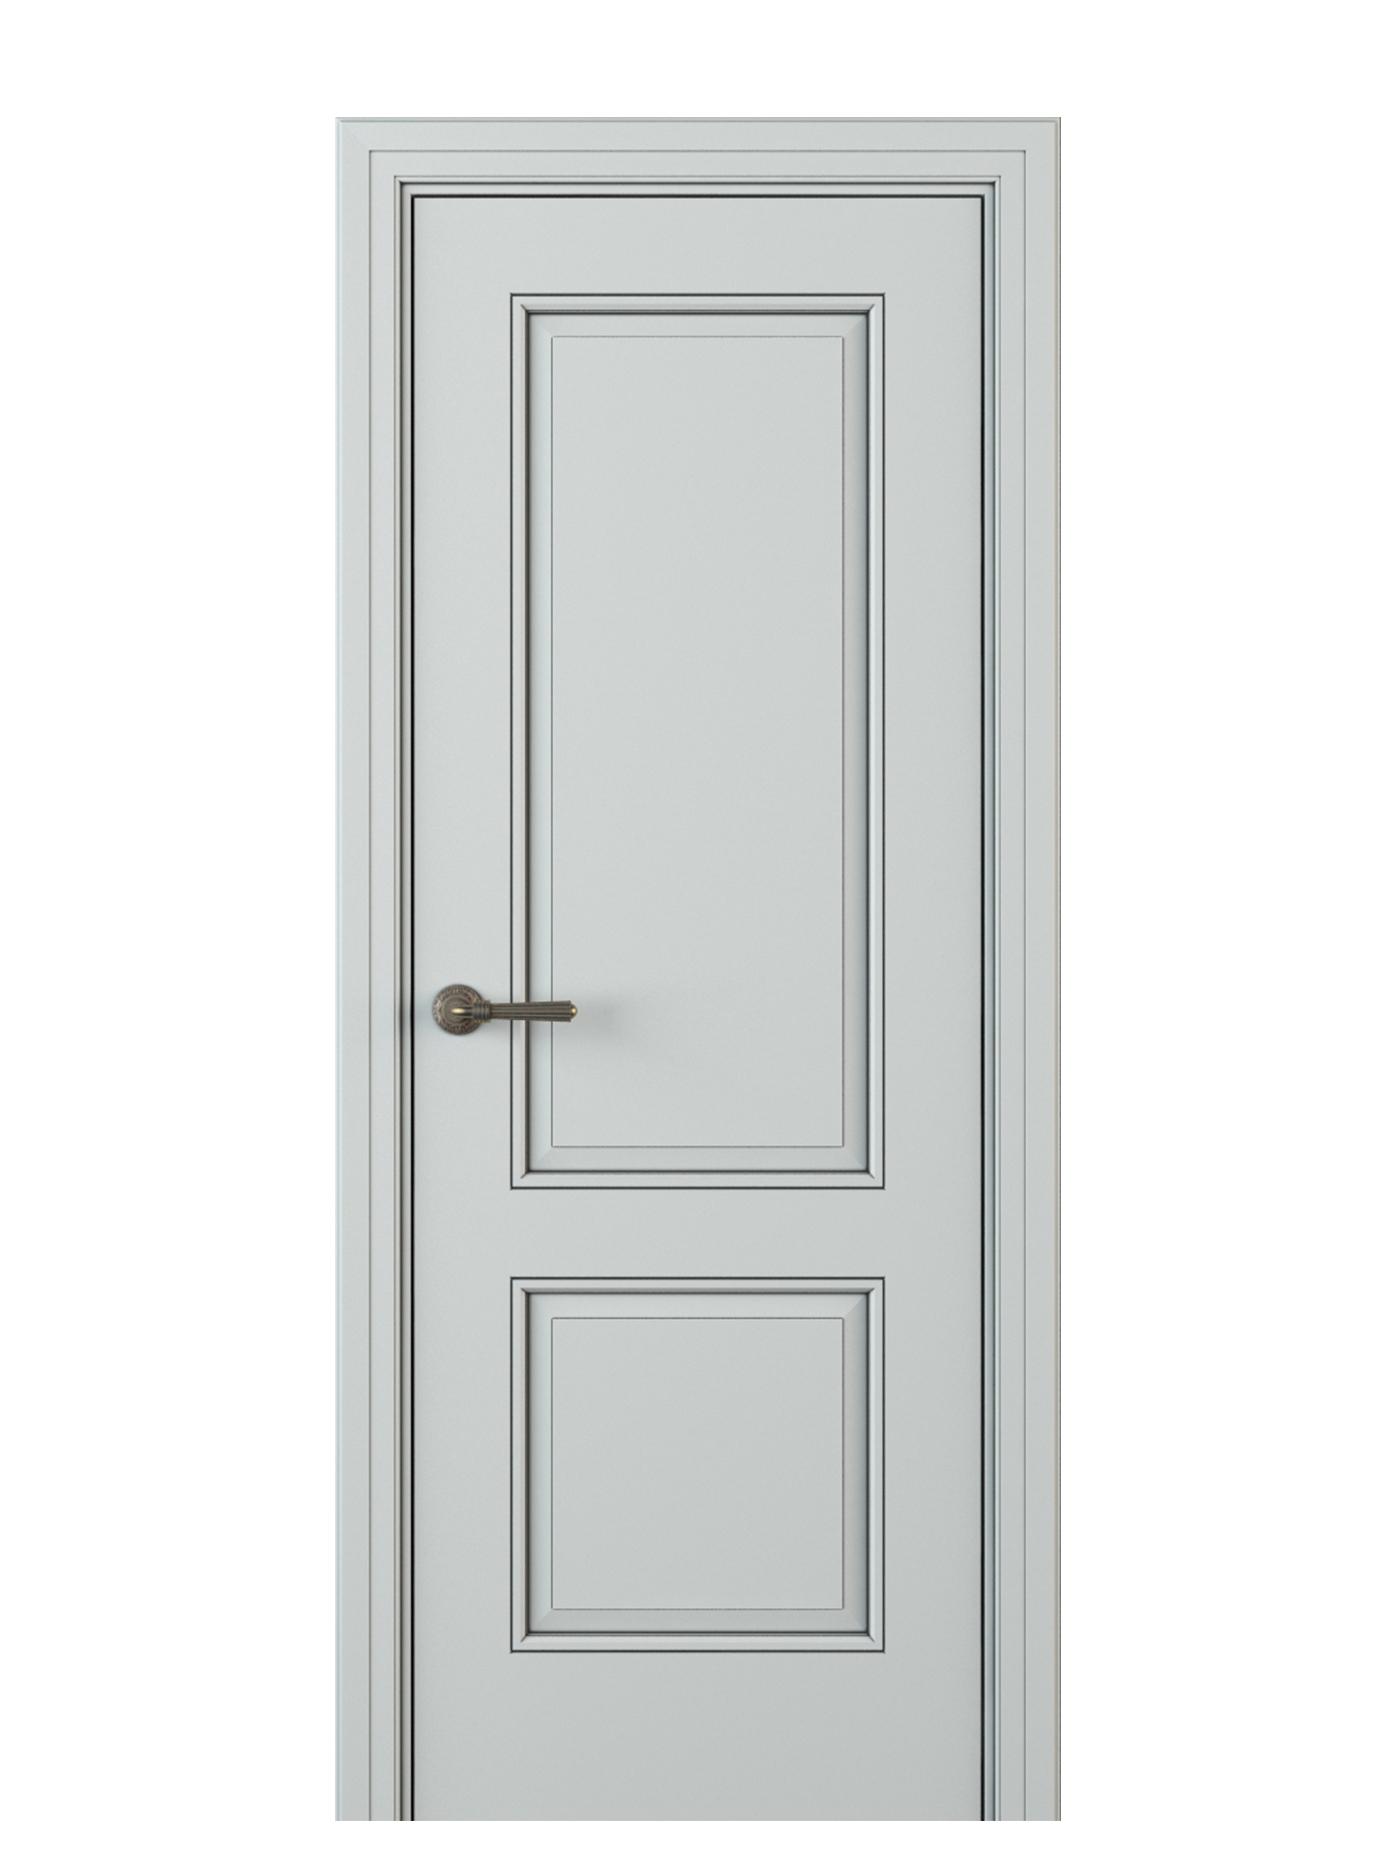 Image Donori Interior Door Italian Enamel 7035 0